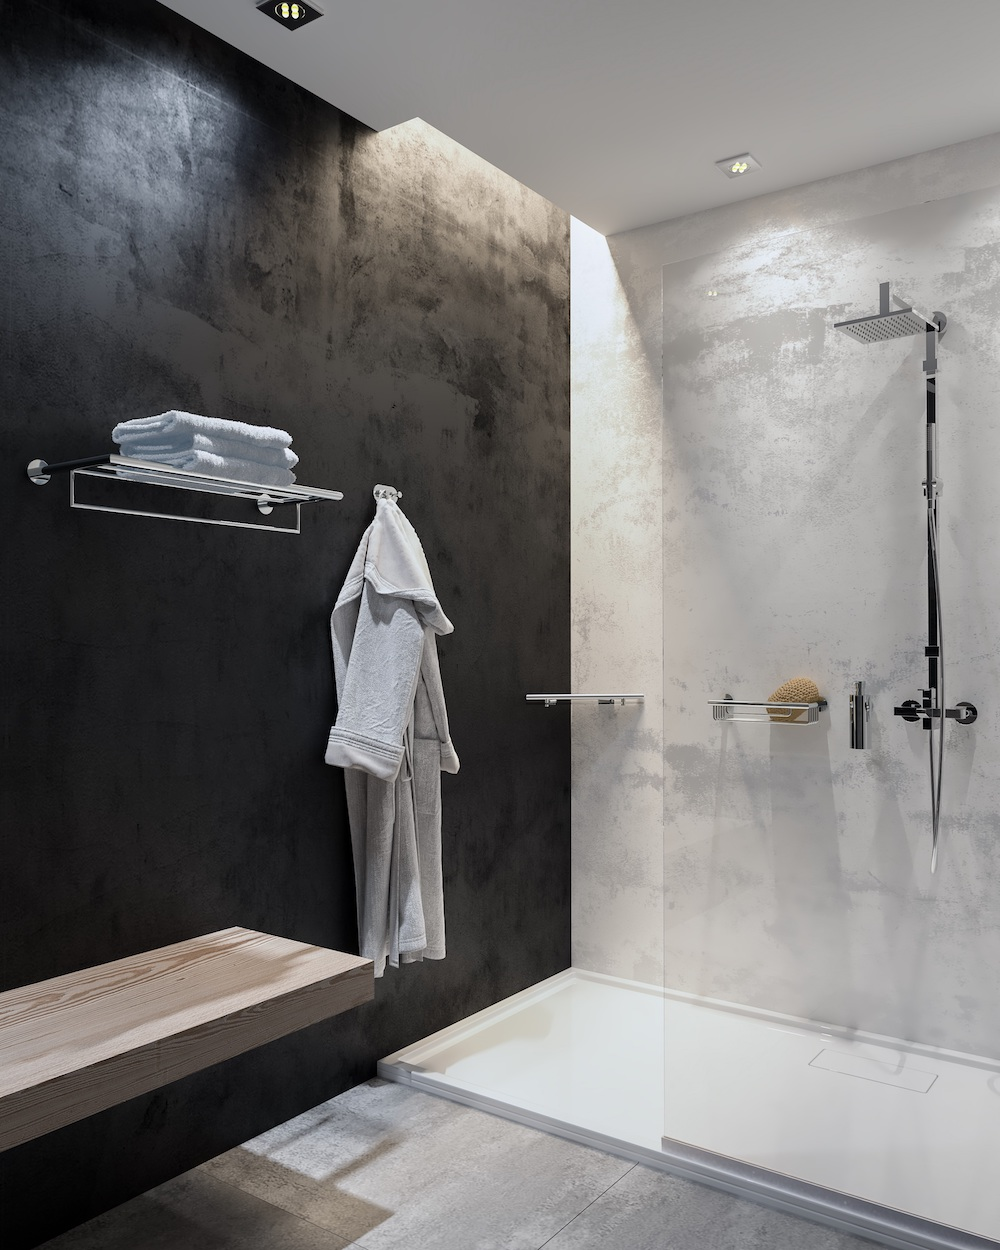 Welke badkamer wandhaak vind jij handig?